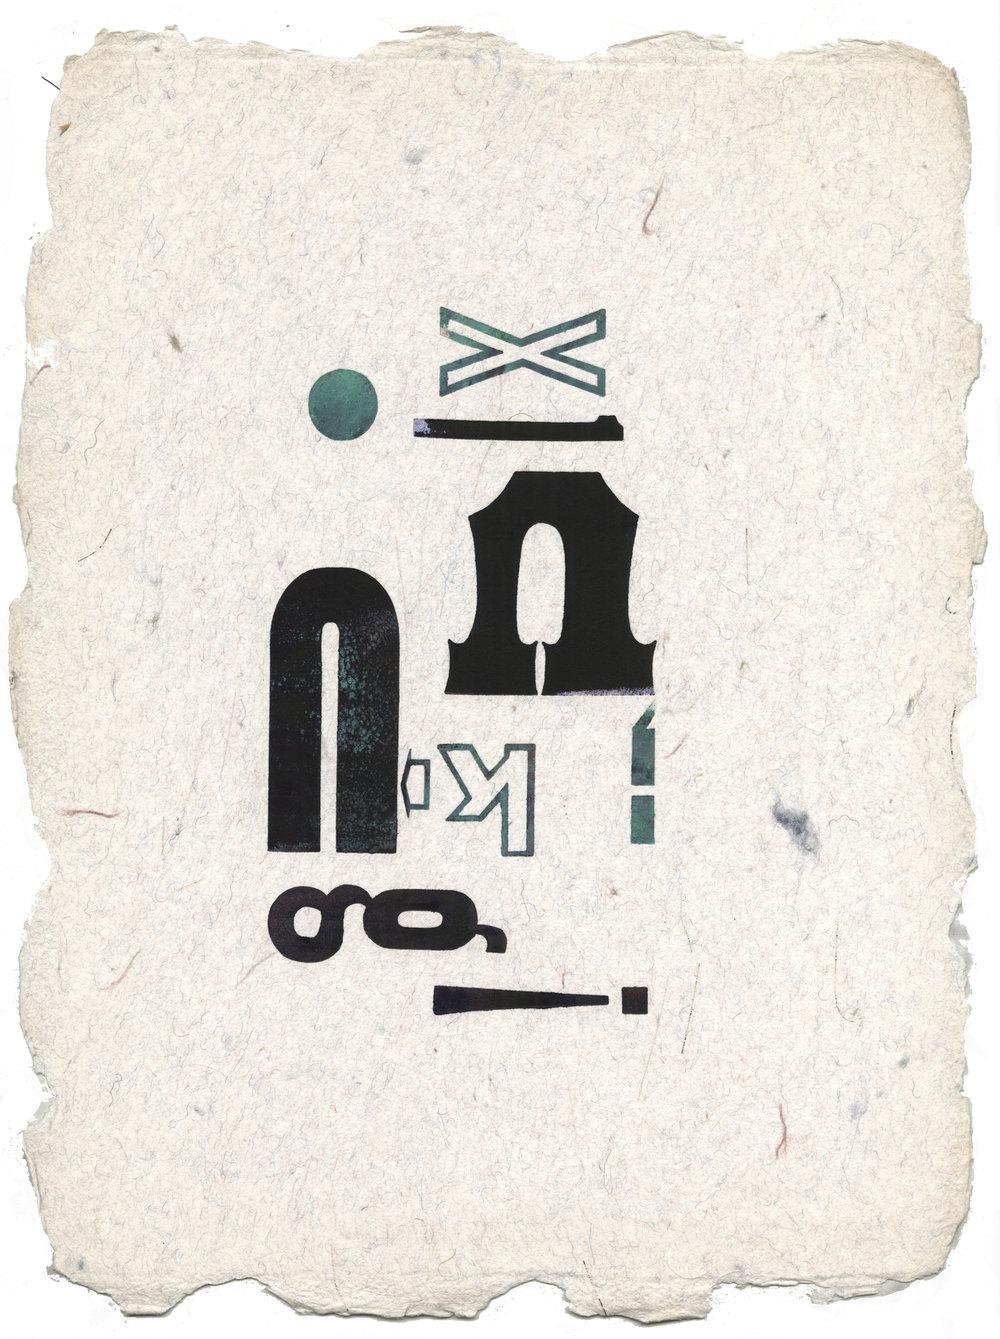 letterpress009 copy copy.jpg